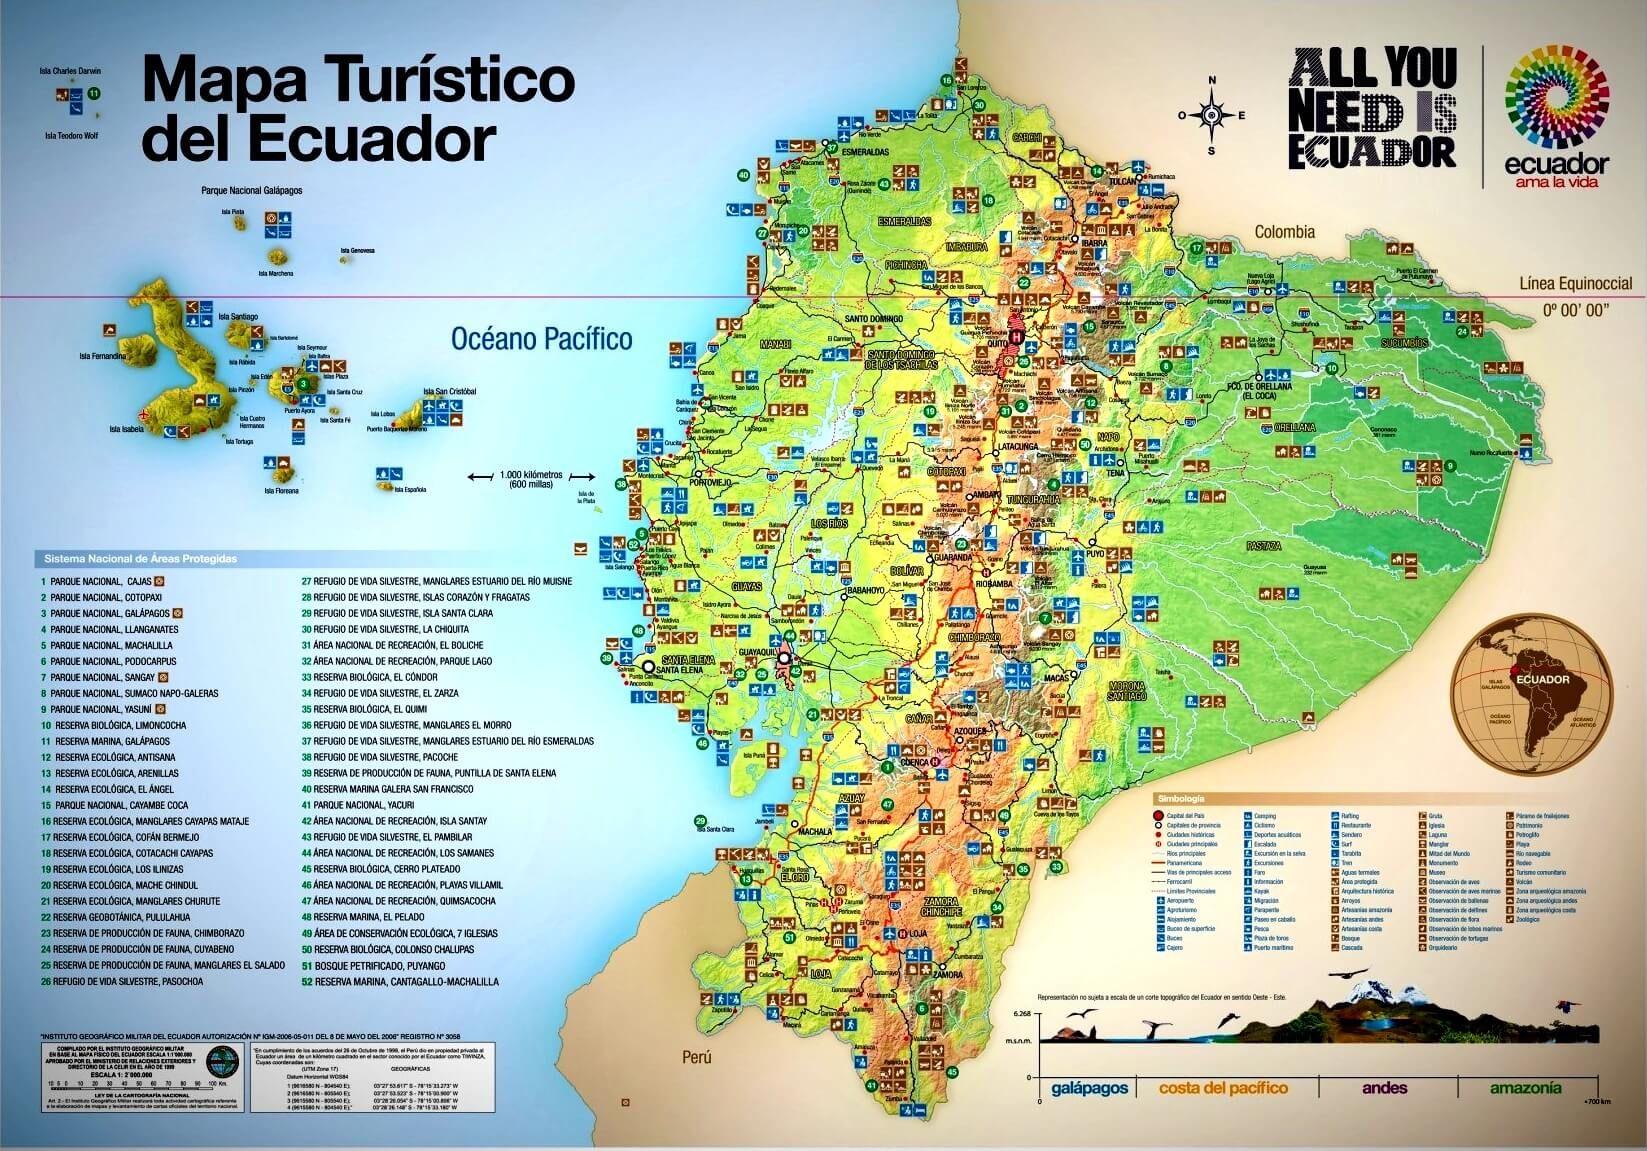 Ecuador Tourist Attractions Map Tourist Map Tourist Tourist Attraction